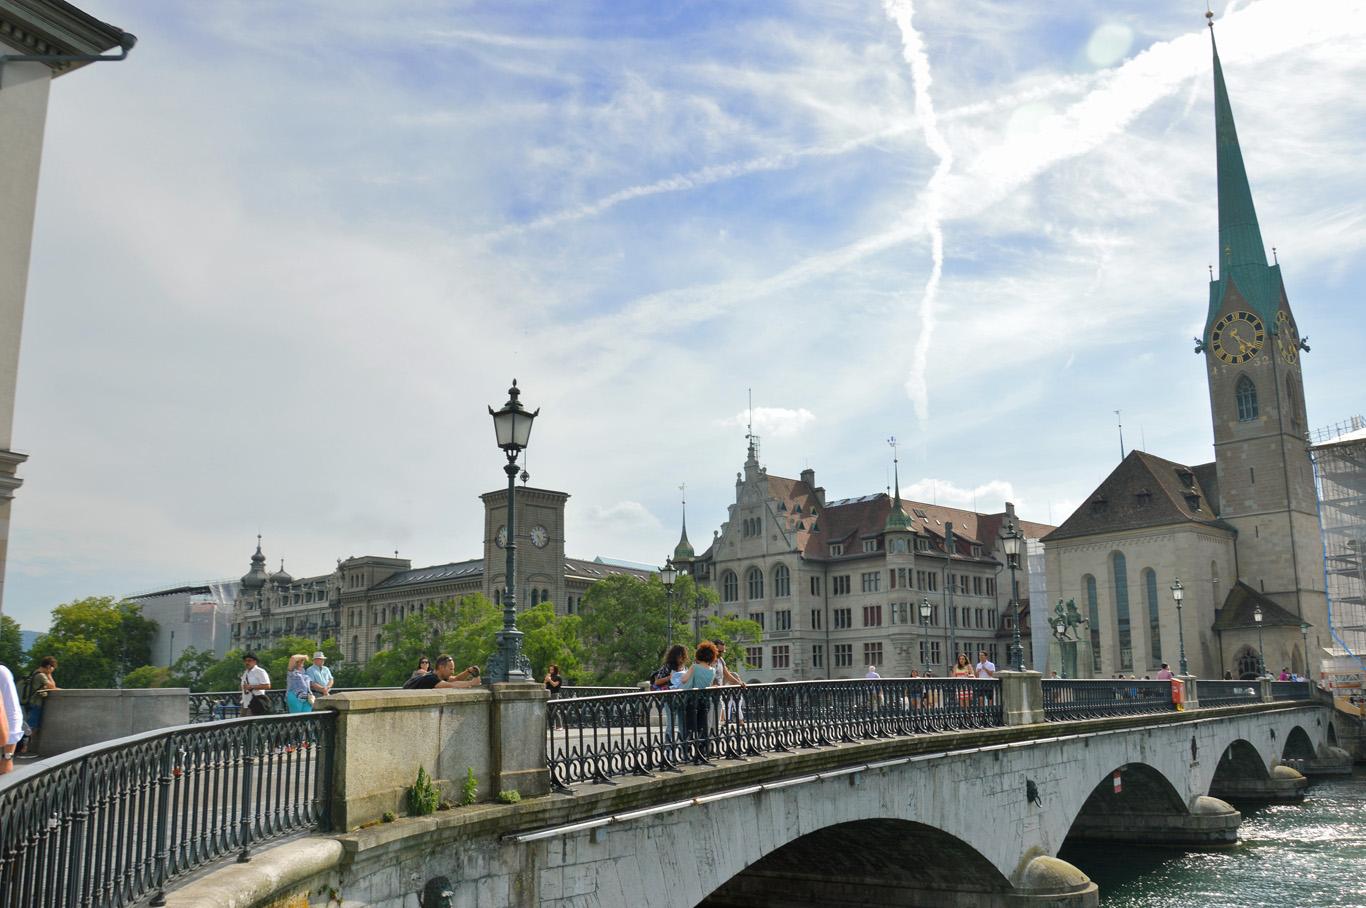 Munsterbrucke bridge